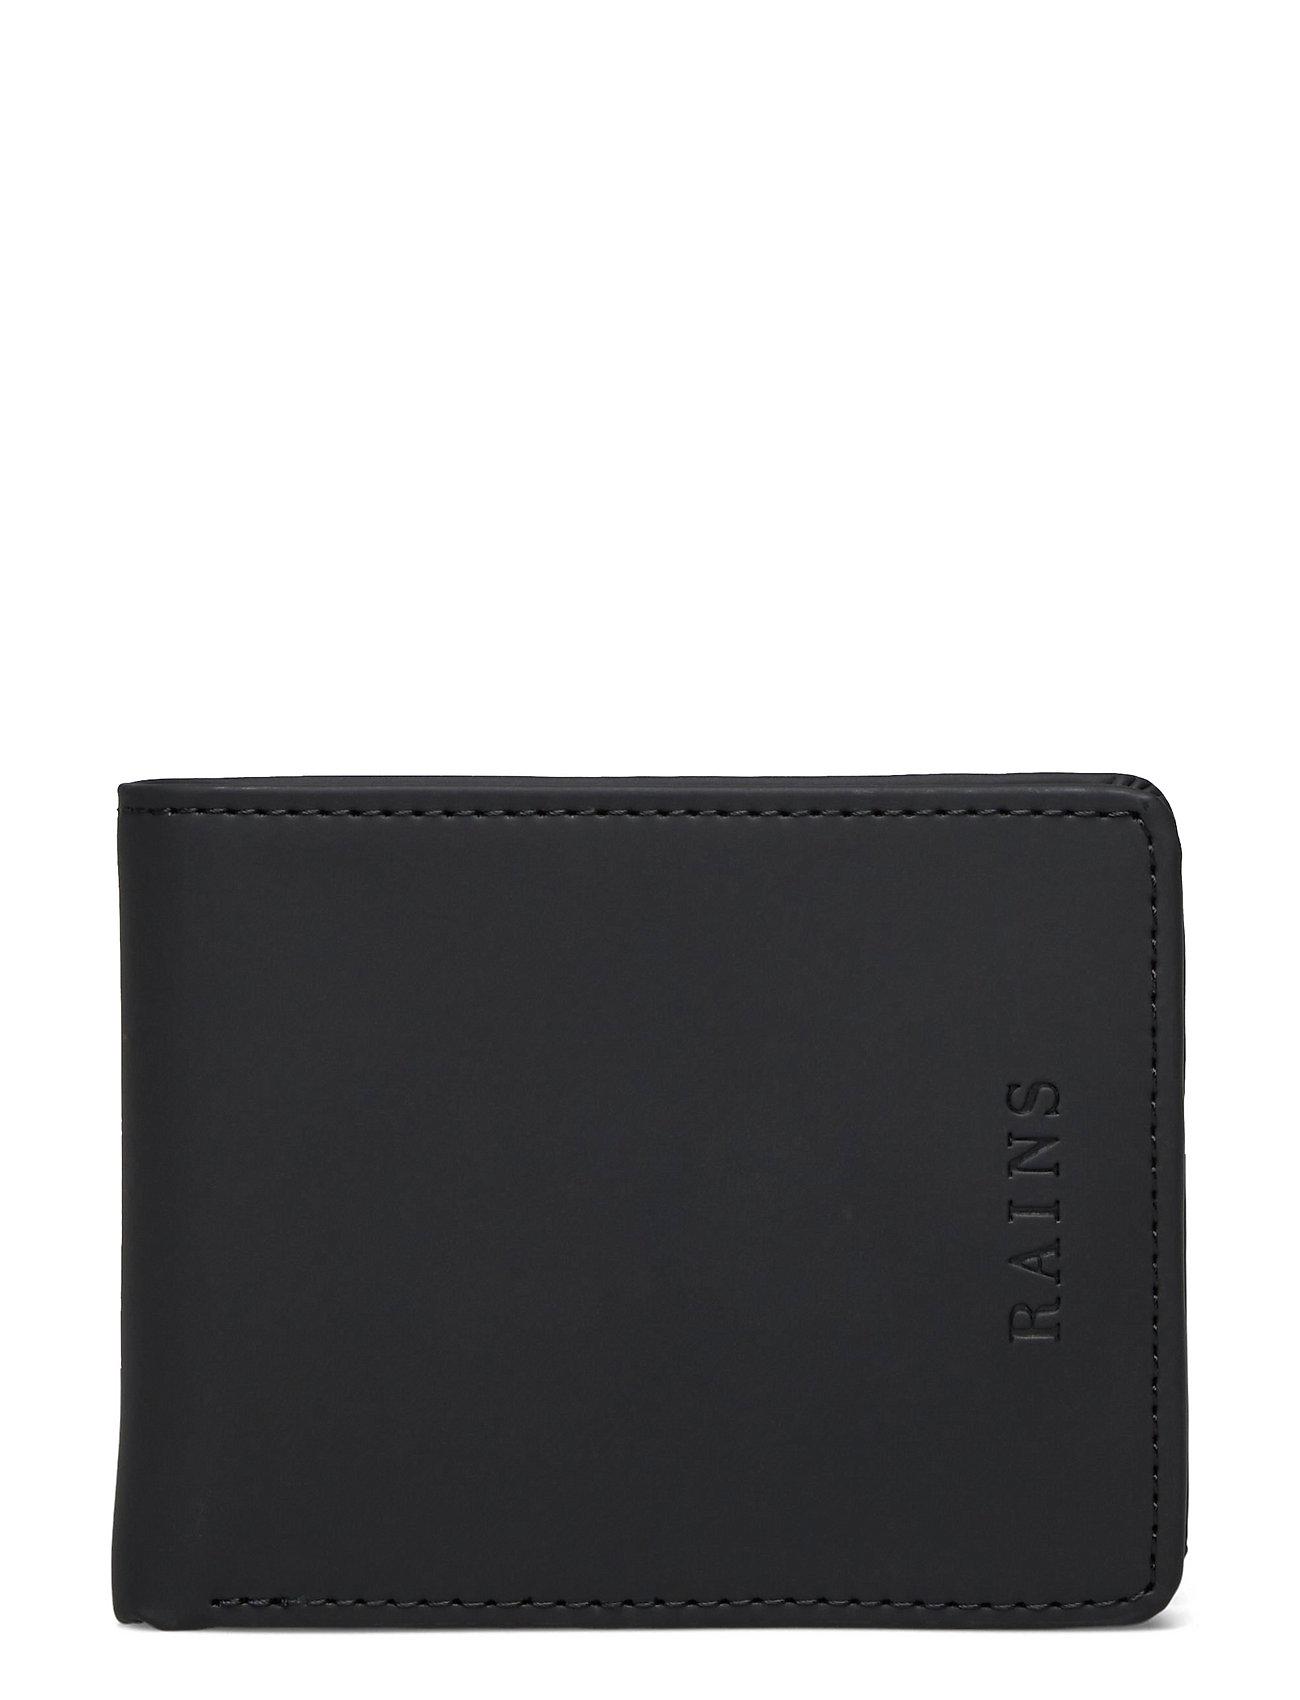 Folded Wallet Accessories Wallets Cardholder Sort Rains